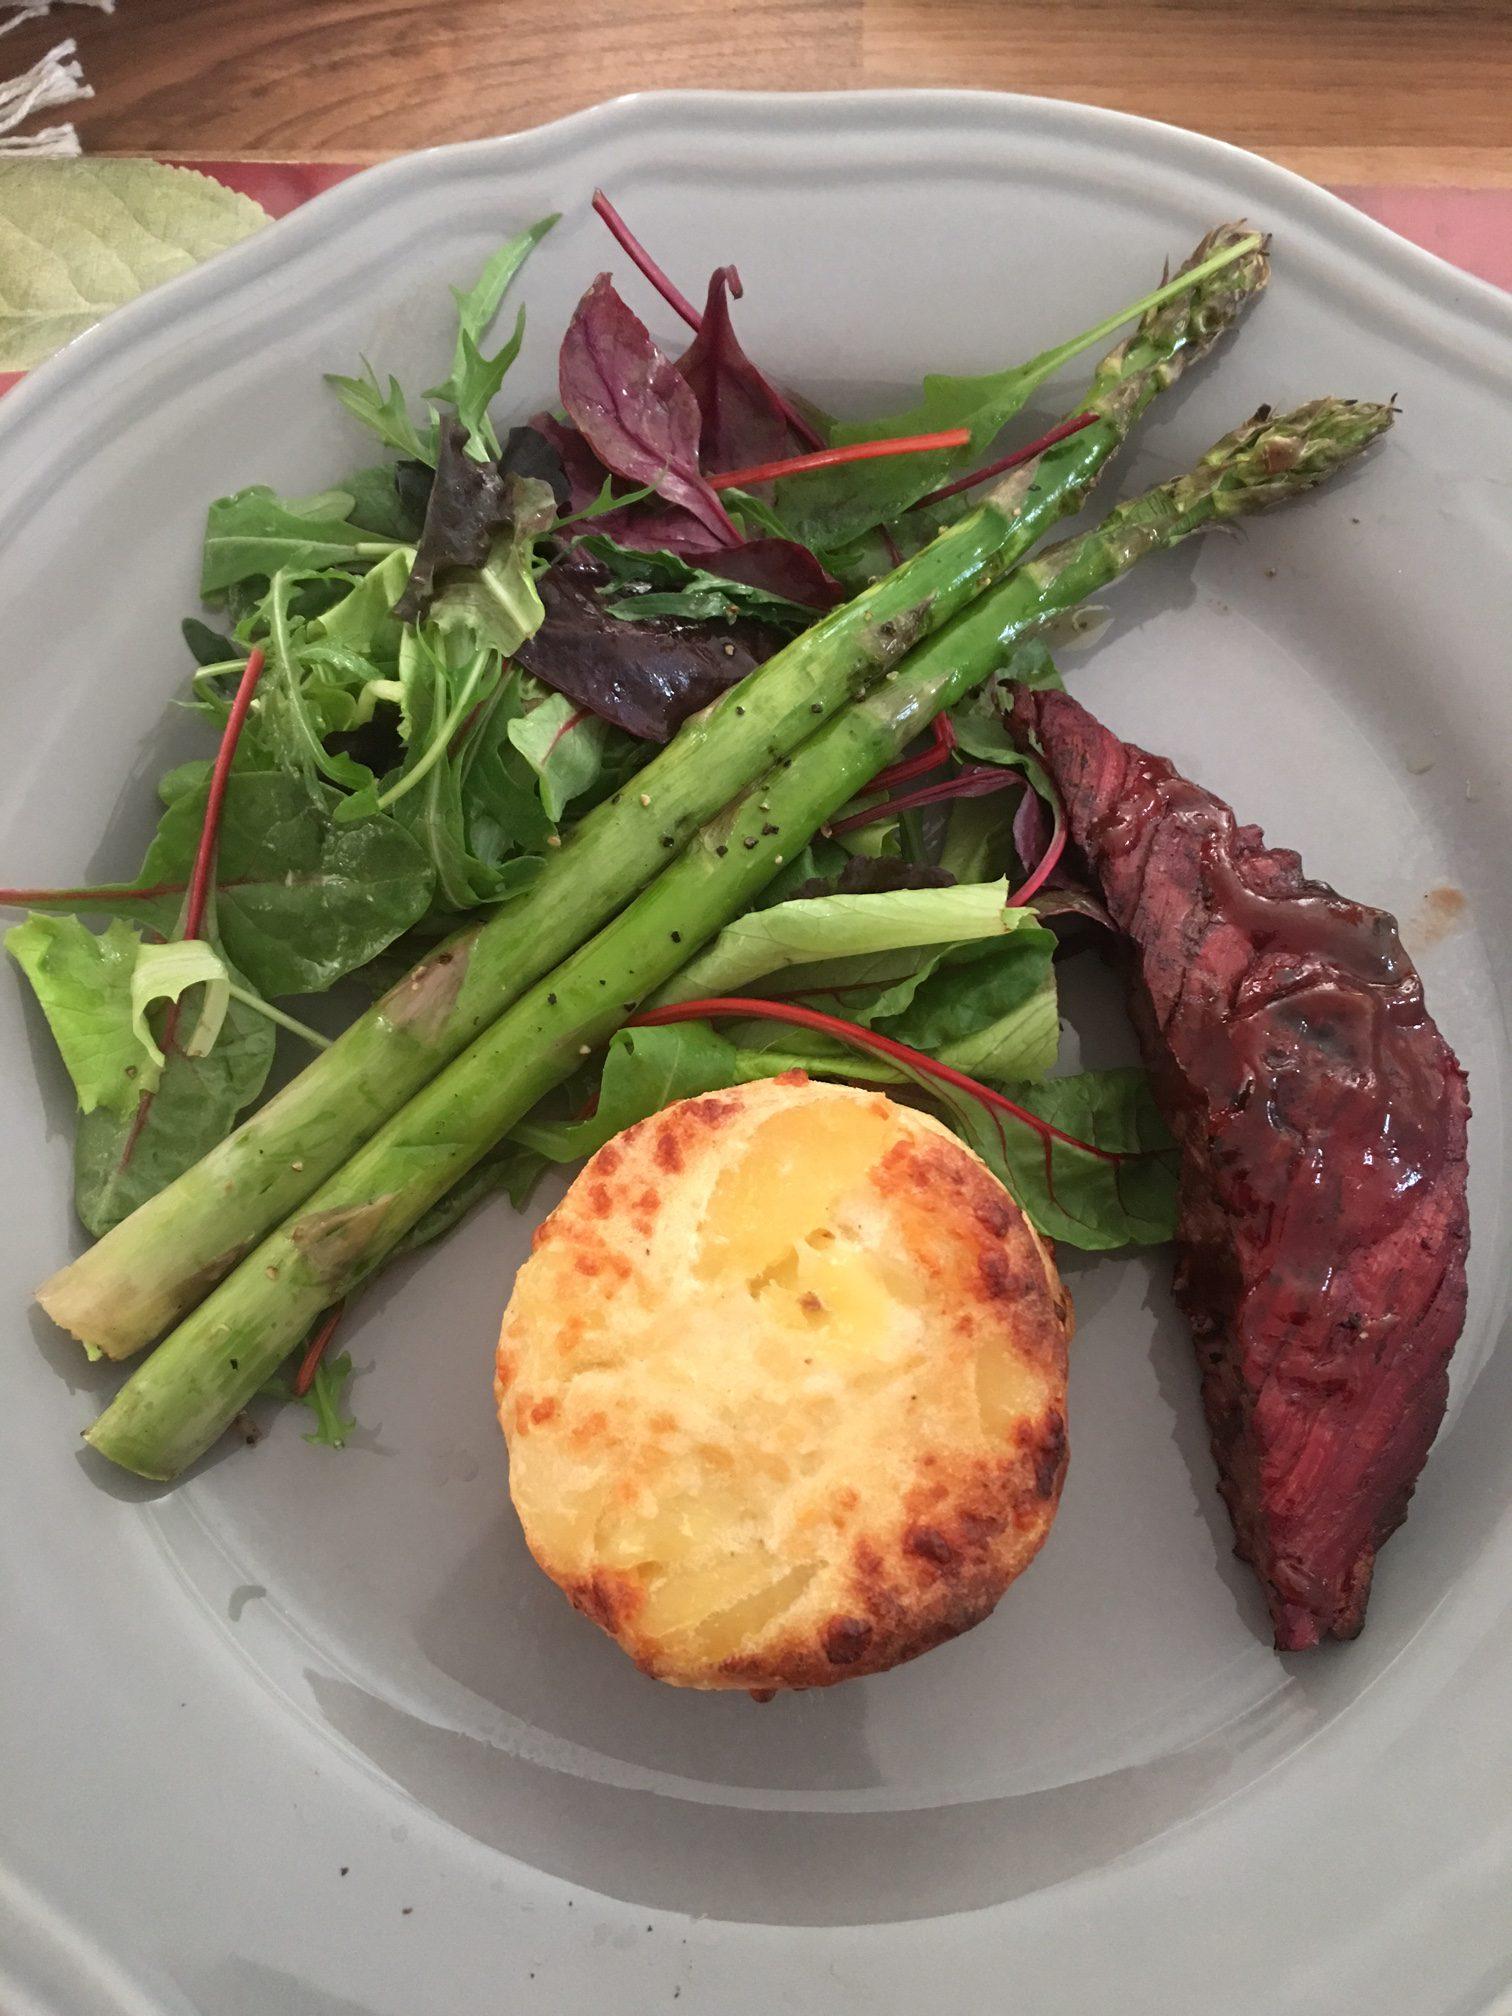 Grillad flankstek med sparris och potatisbakelser